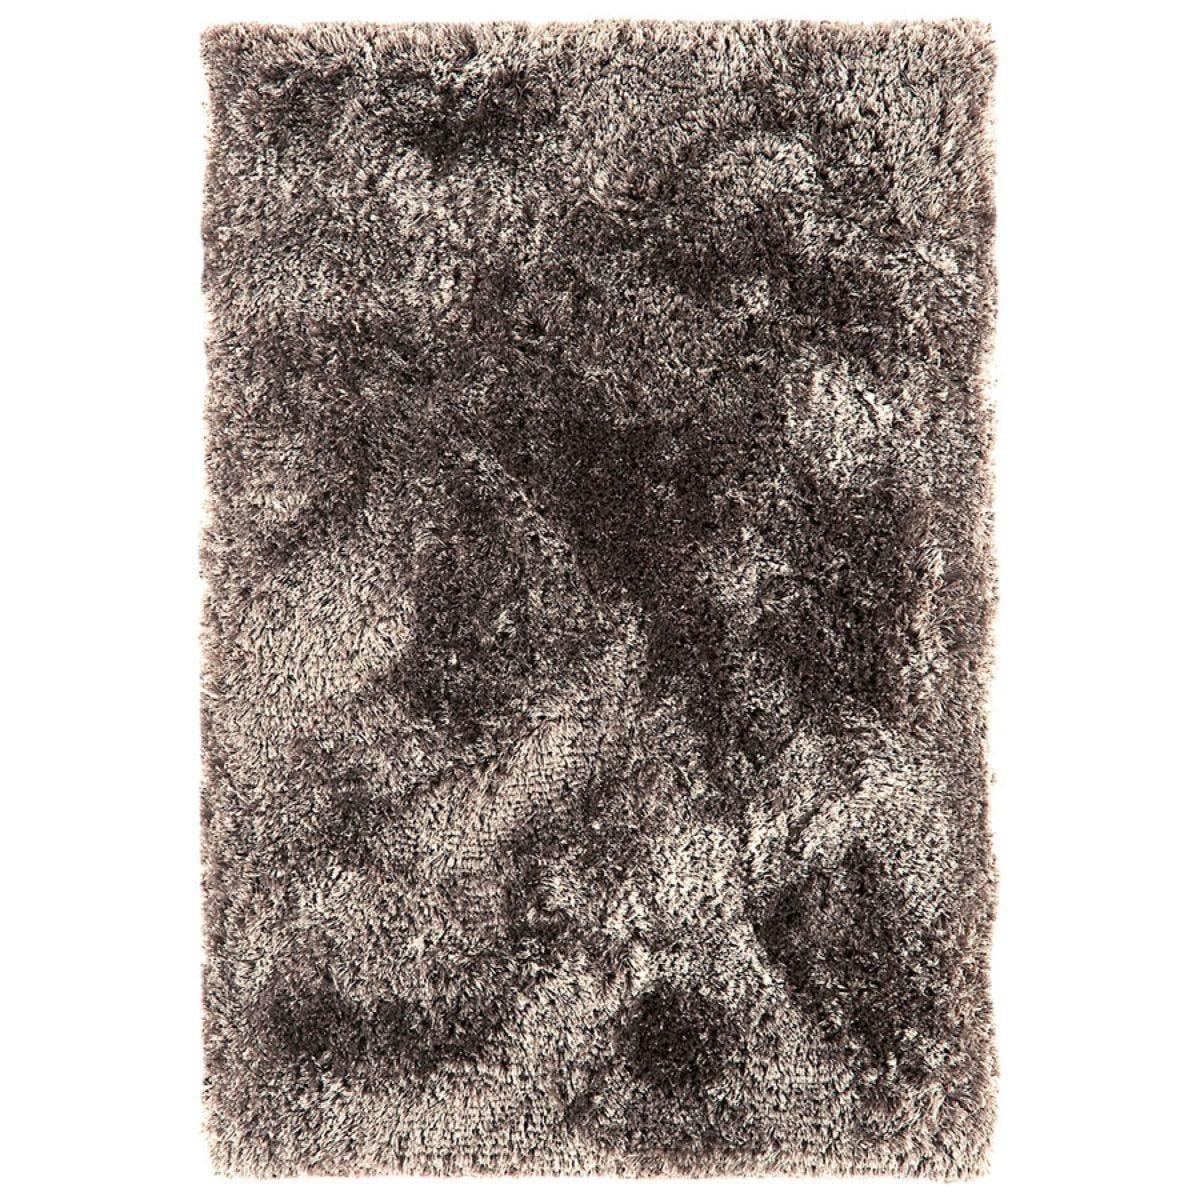 Asiatic Plush Shaggy Rug, 70 x 140cm - Zinc